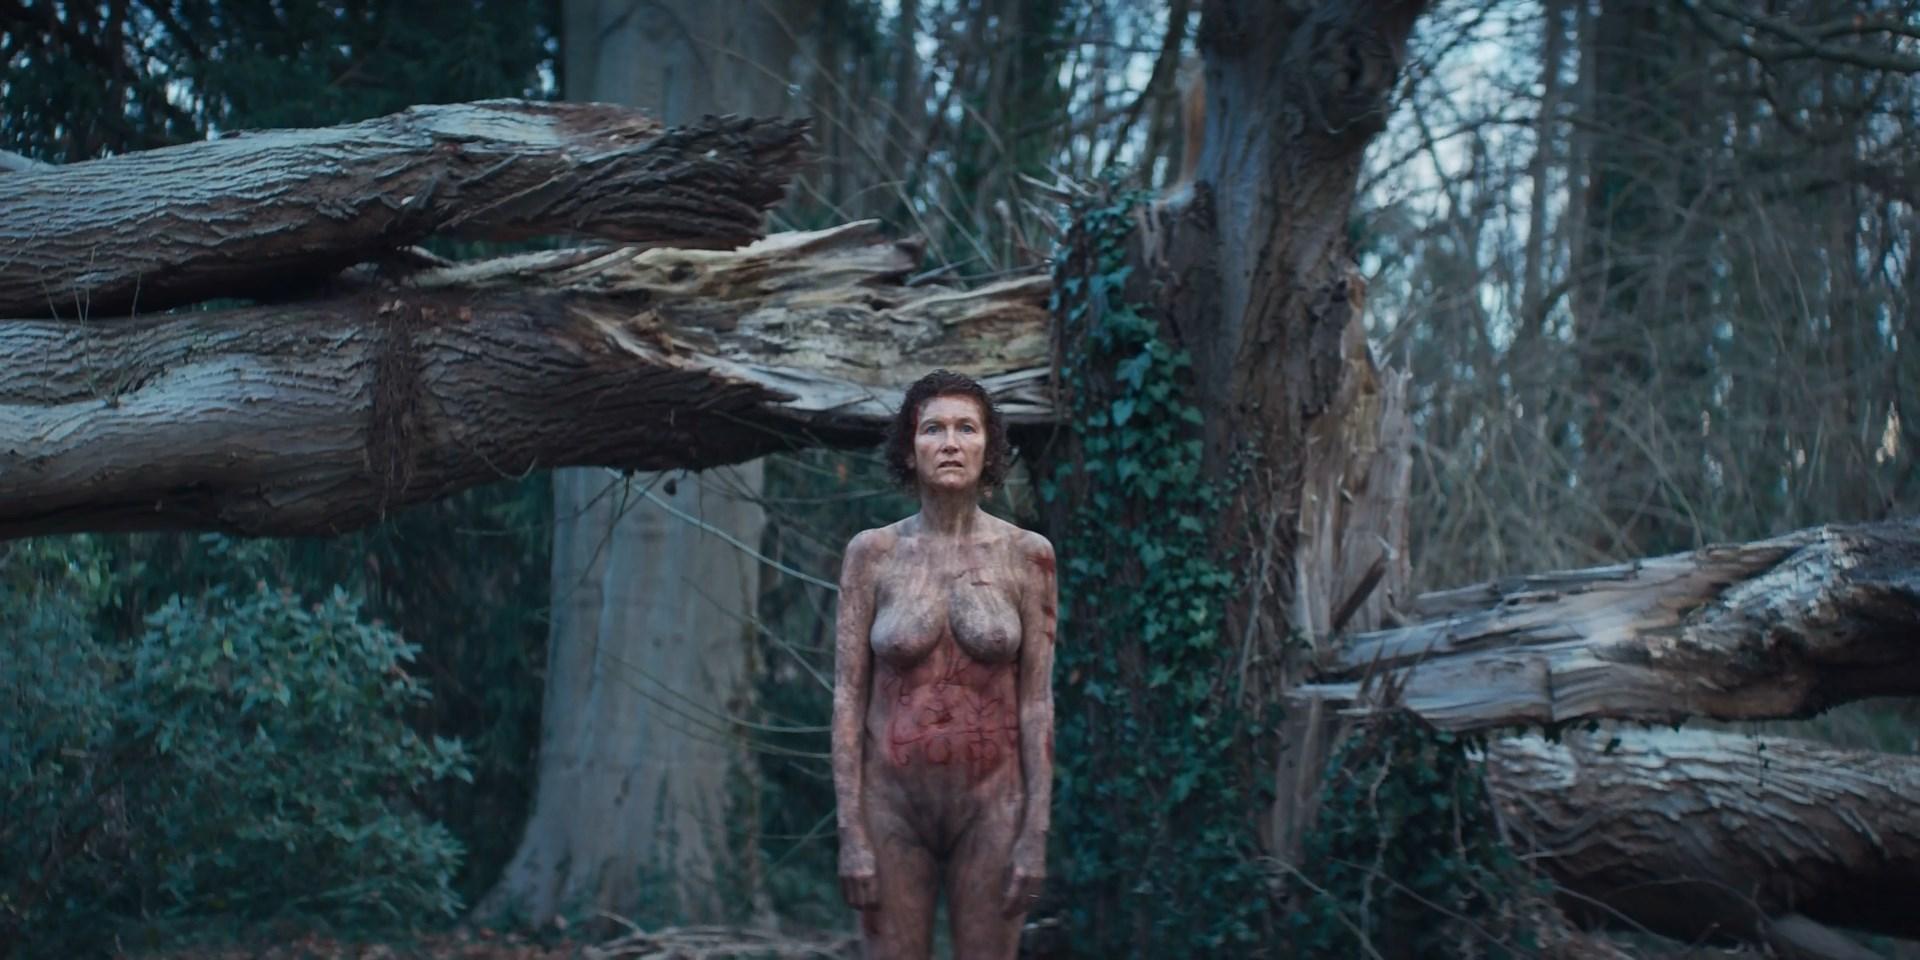 Corinne Valancogne nude - Marianne s01e01-03 (2019)